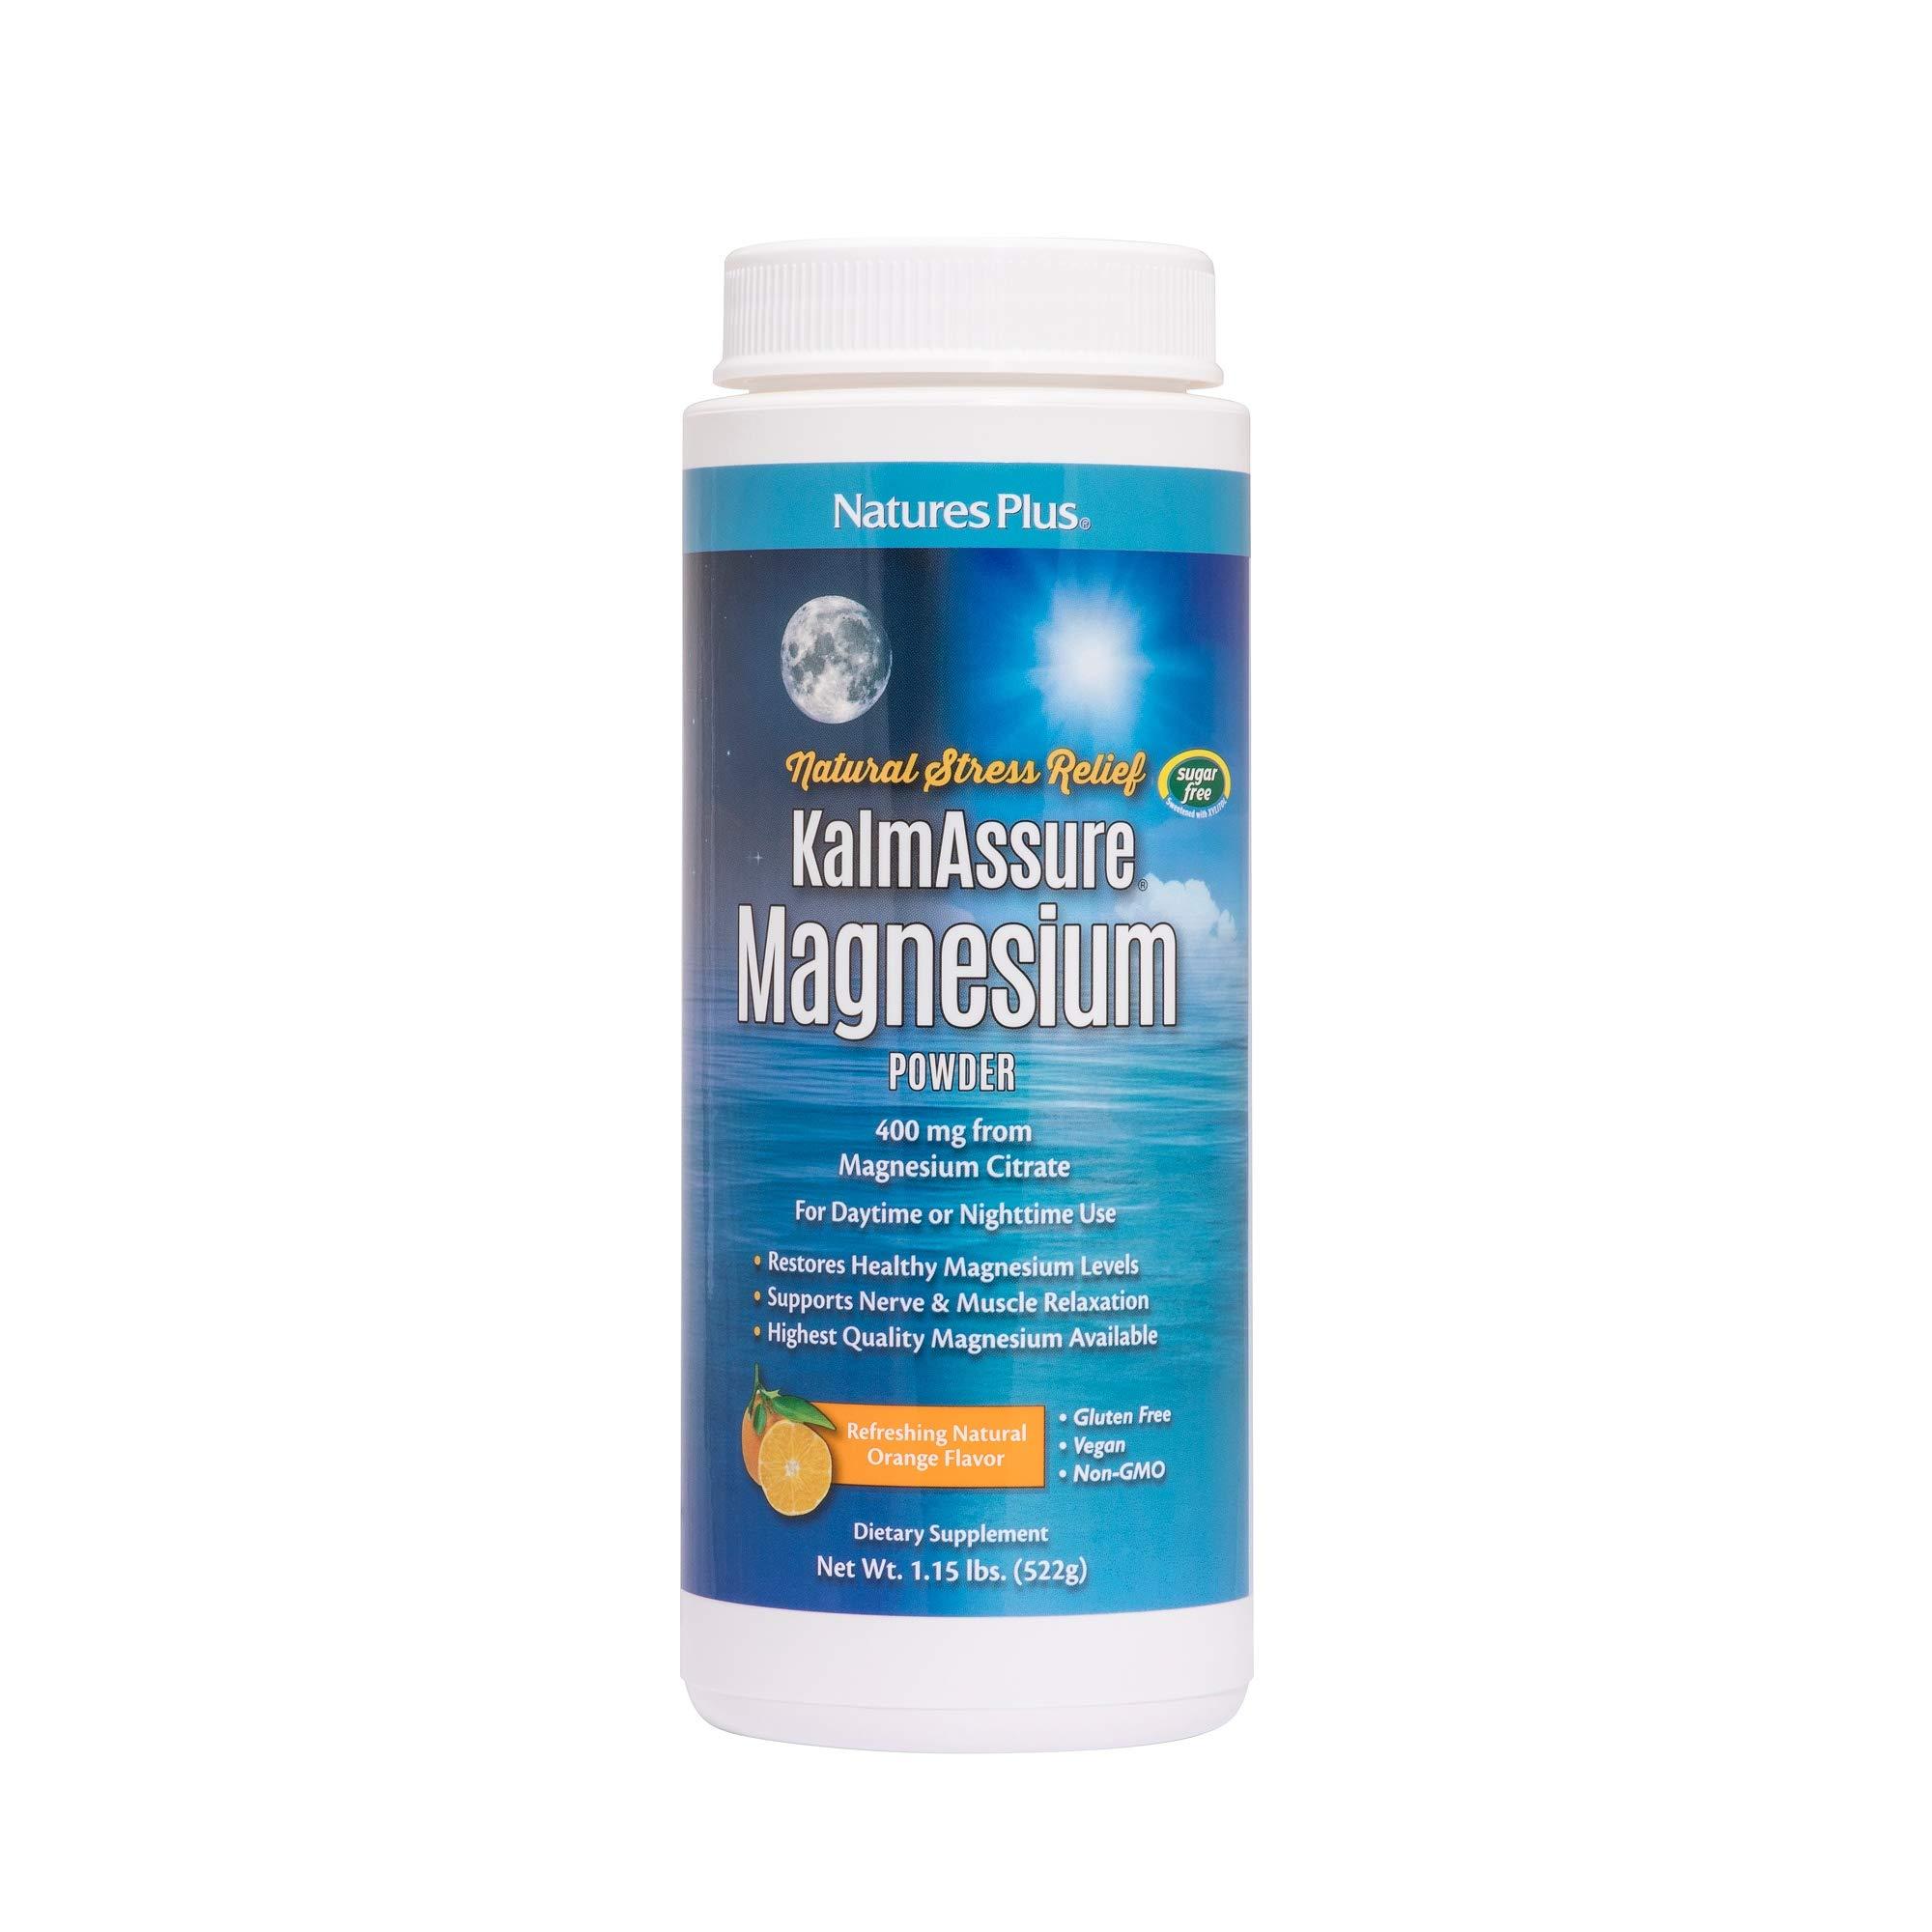 NaturesPlus Kalmassure Magnesium Powder - 400 mg, Vegan Powder - Orange Flavor - Natural Stress Relief, Supports Nerve and Muscle Relaxation - Non-GMO, Vegetarian, Gluten-Free - 60 Servings